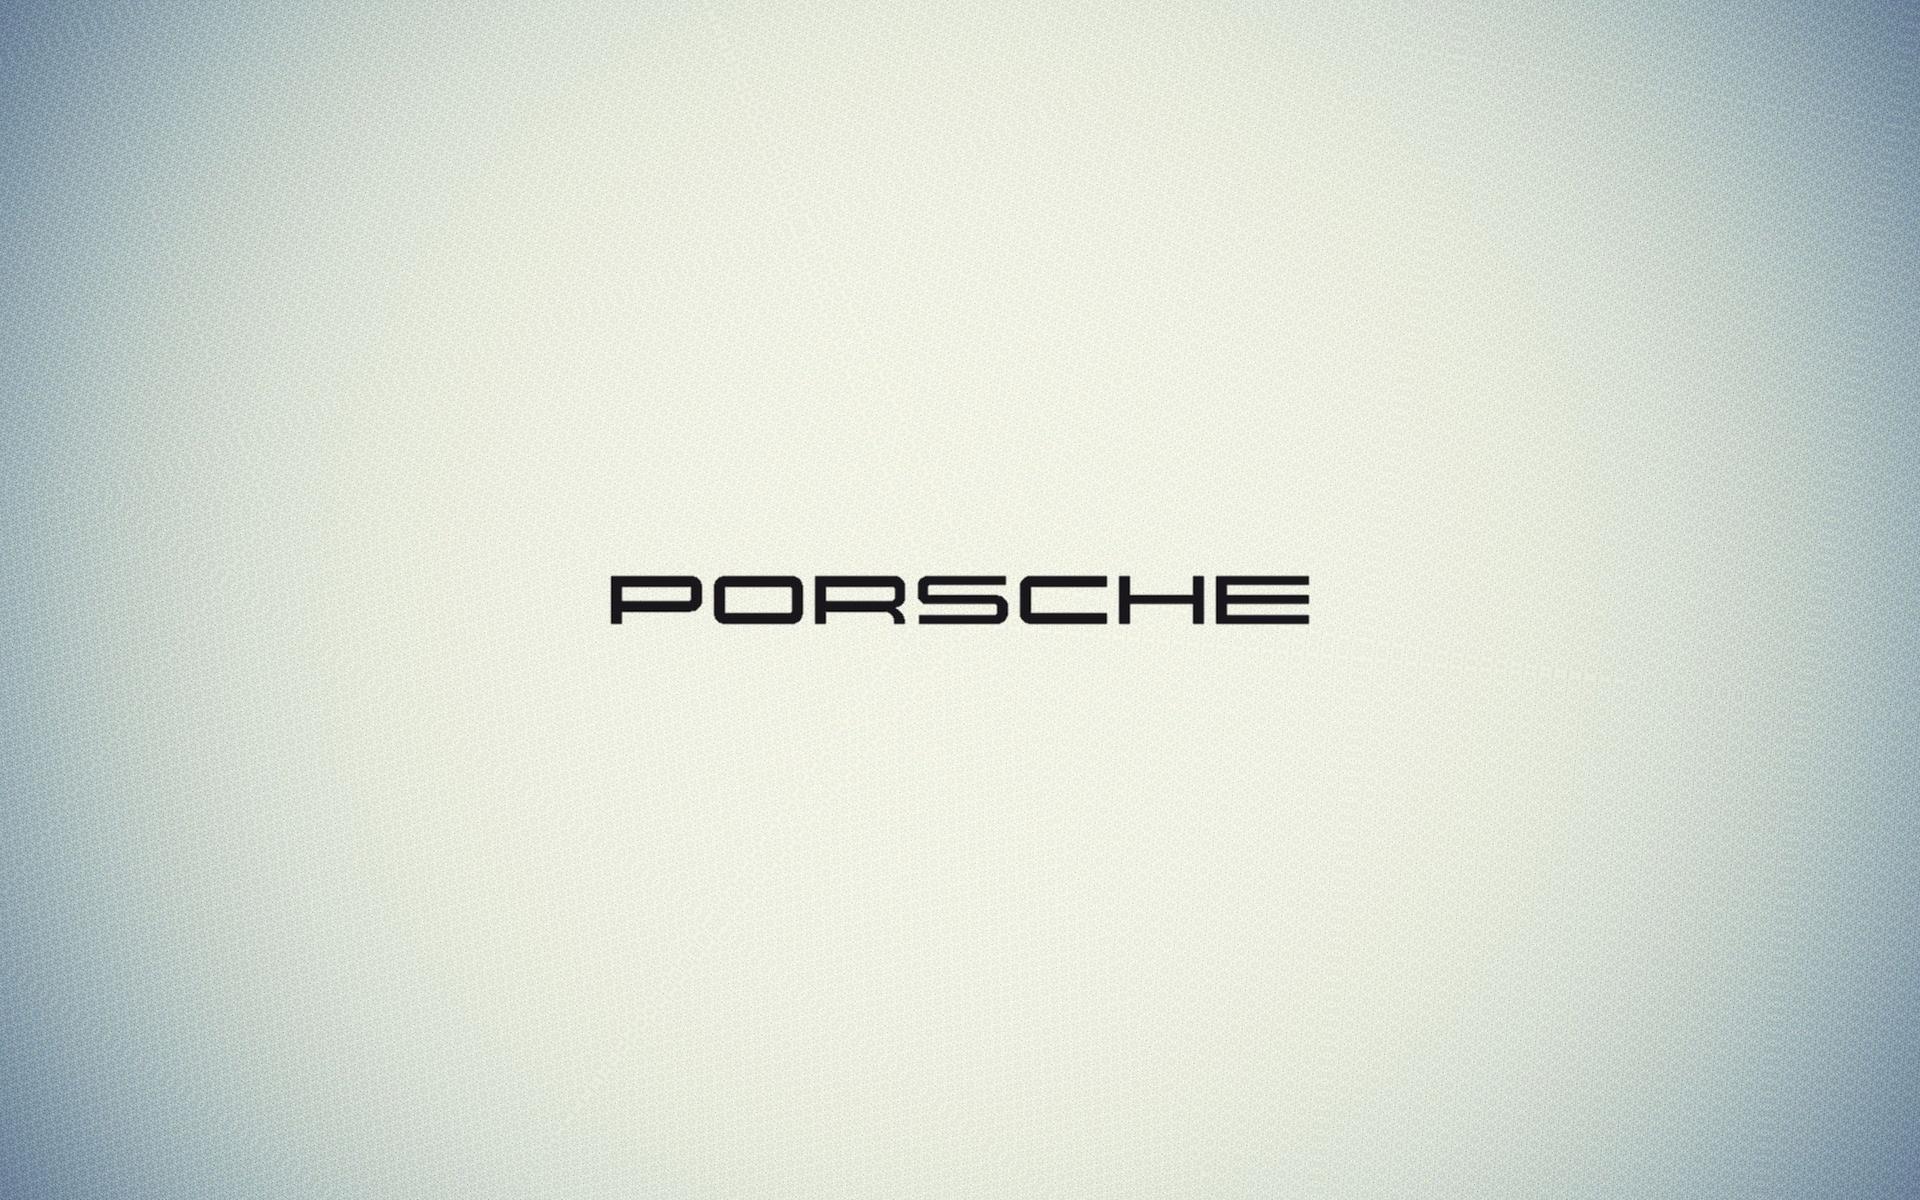 Cellphone Wallpaper Hd Porsche Logo Wallpapers Pictures Images